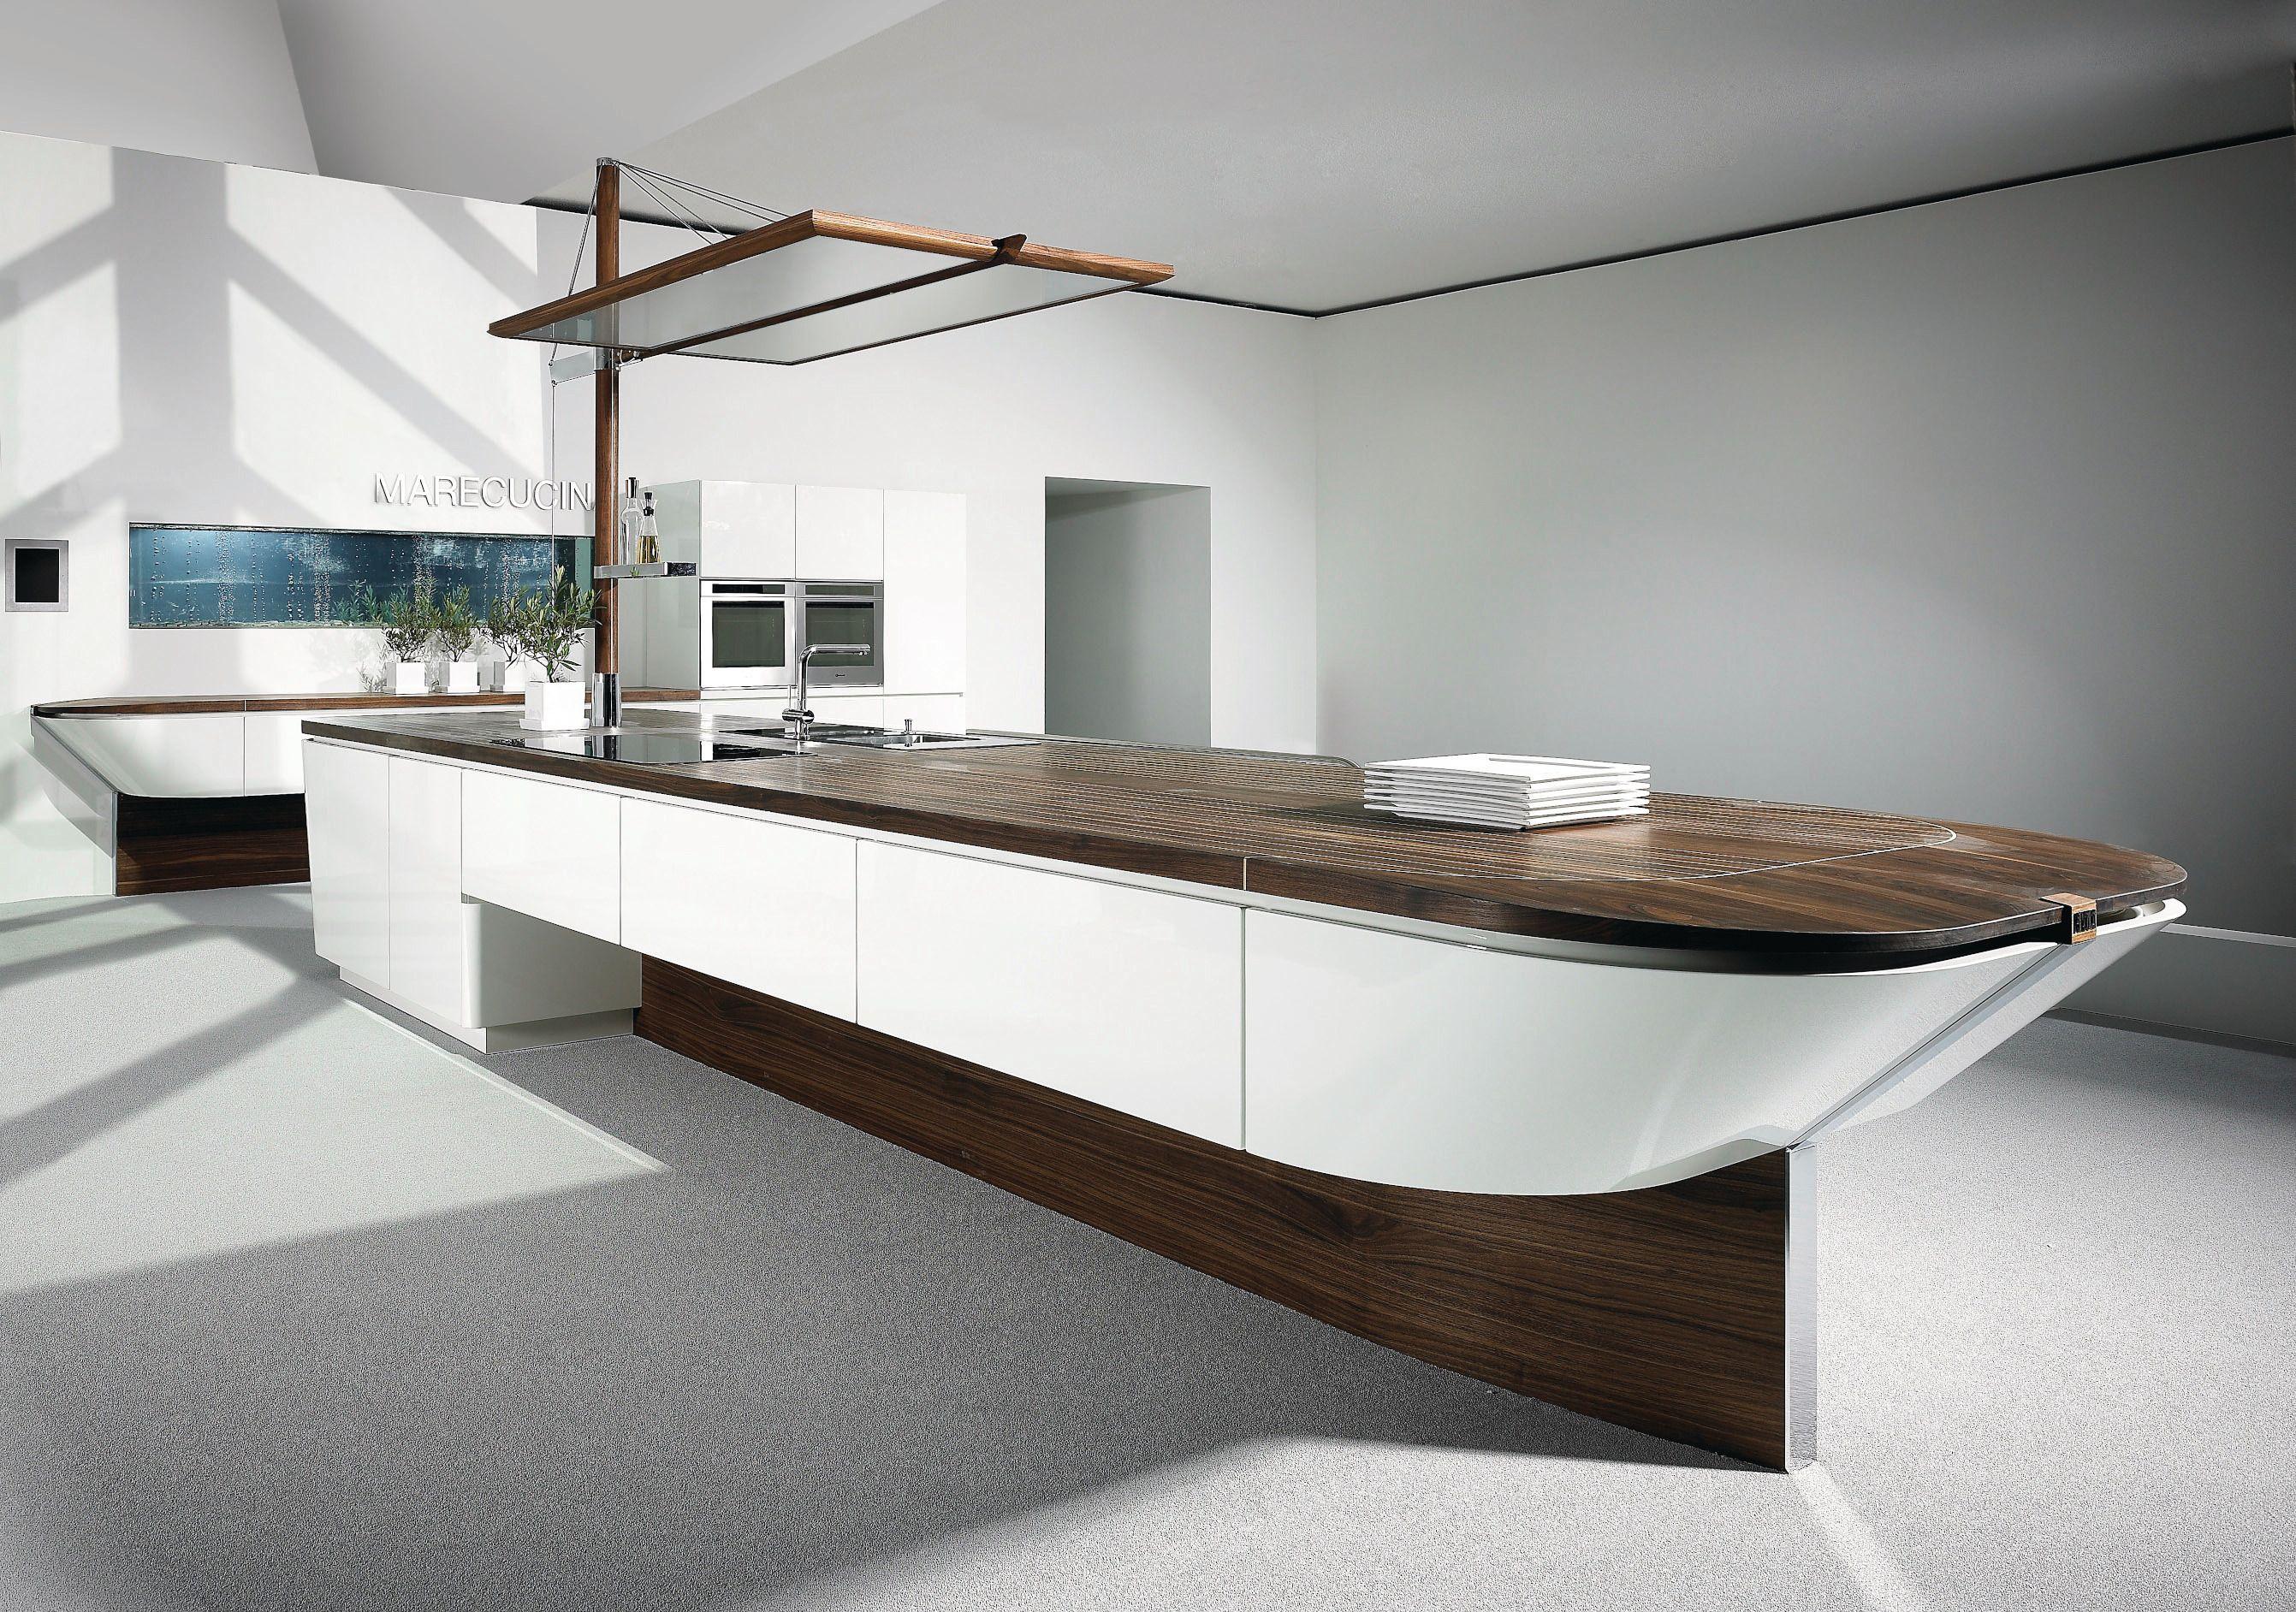 Fontile Kitchen - interesting design. Boat like, wood counters ...